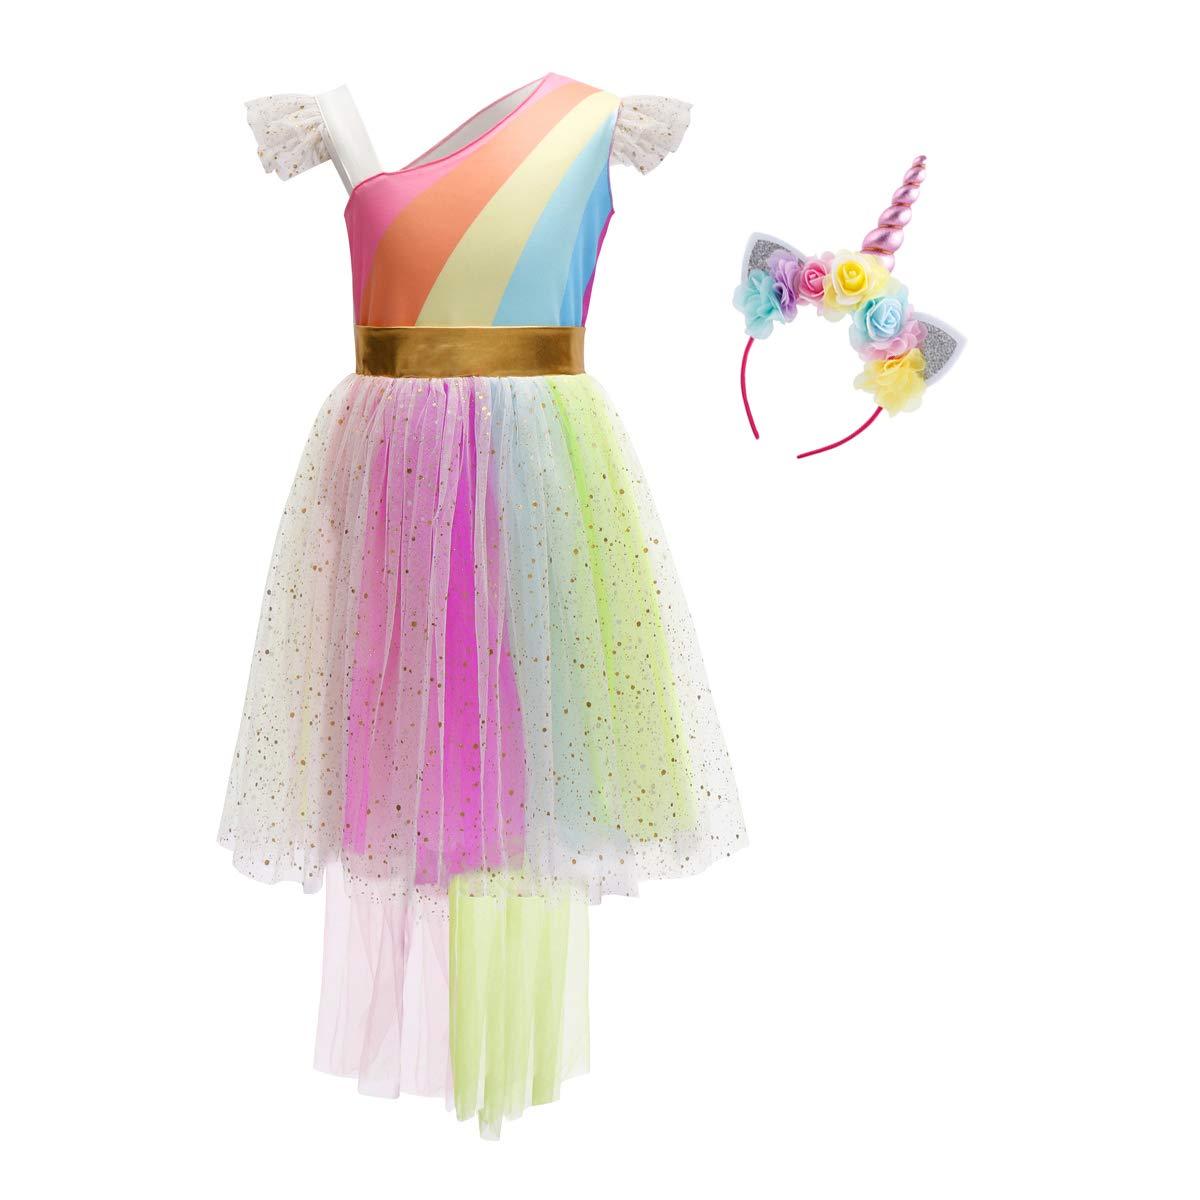 654bee056 Amazon.com: Girls Rainbow Unicorn Birthday Dress up Sequins Ruffle Tulle  Skirt Kids Party Pageant Princess Halloween Fancy Costume: Clothing